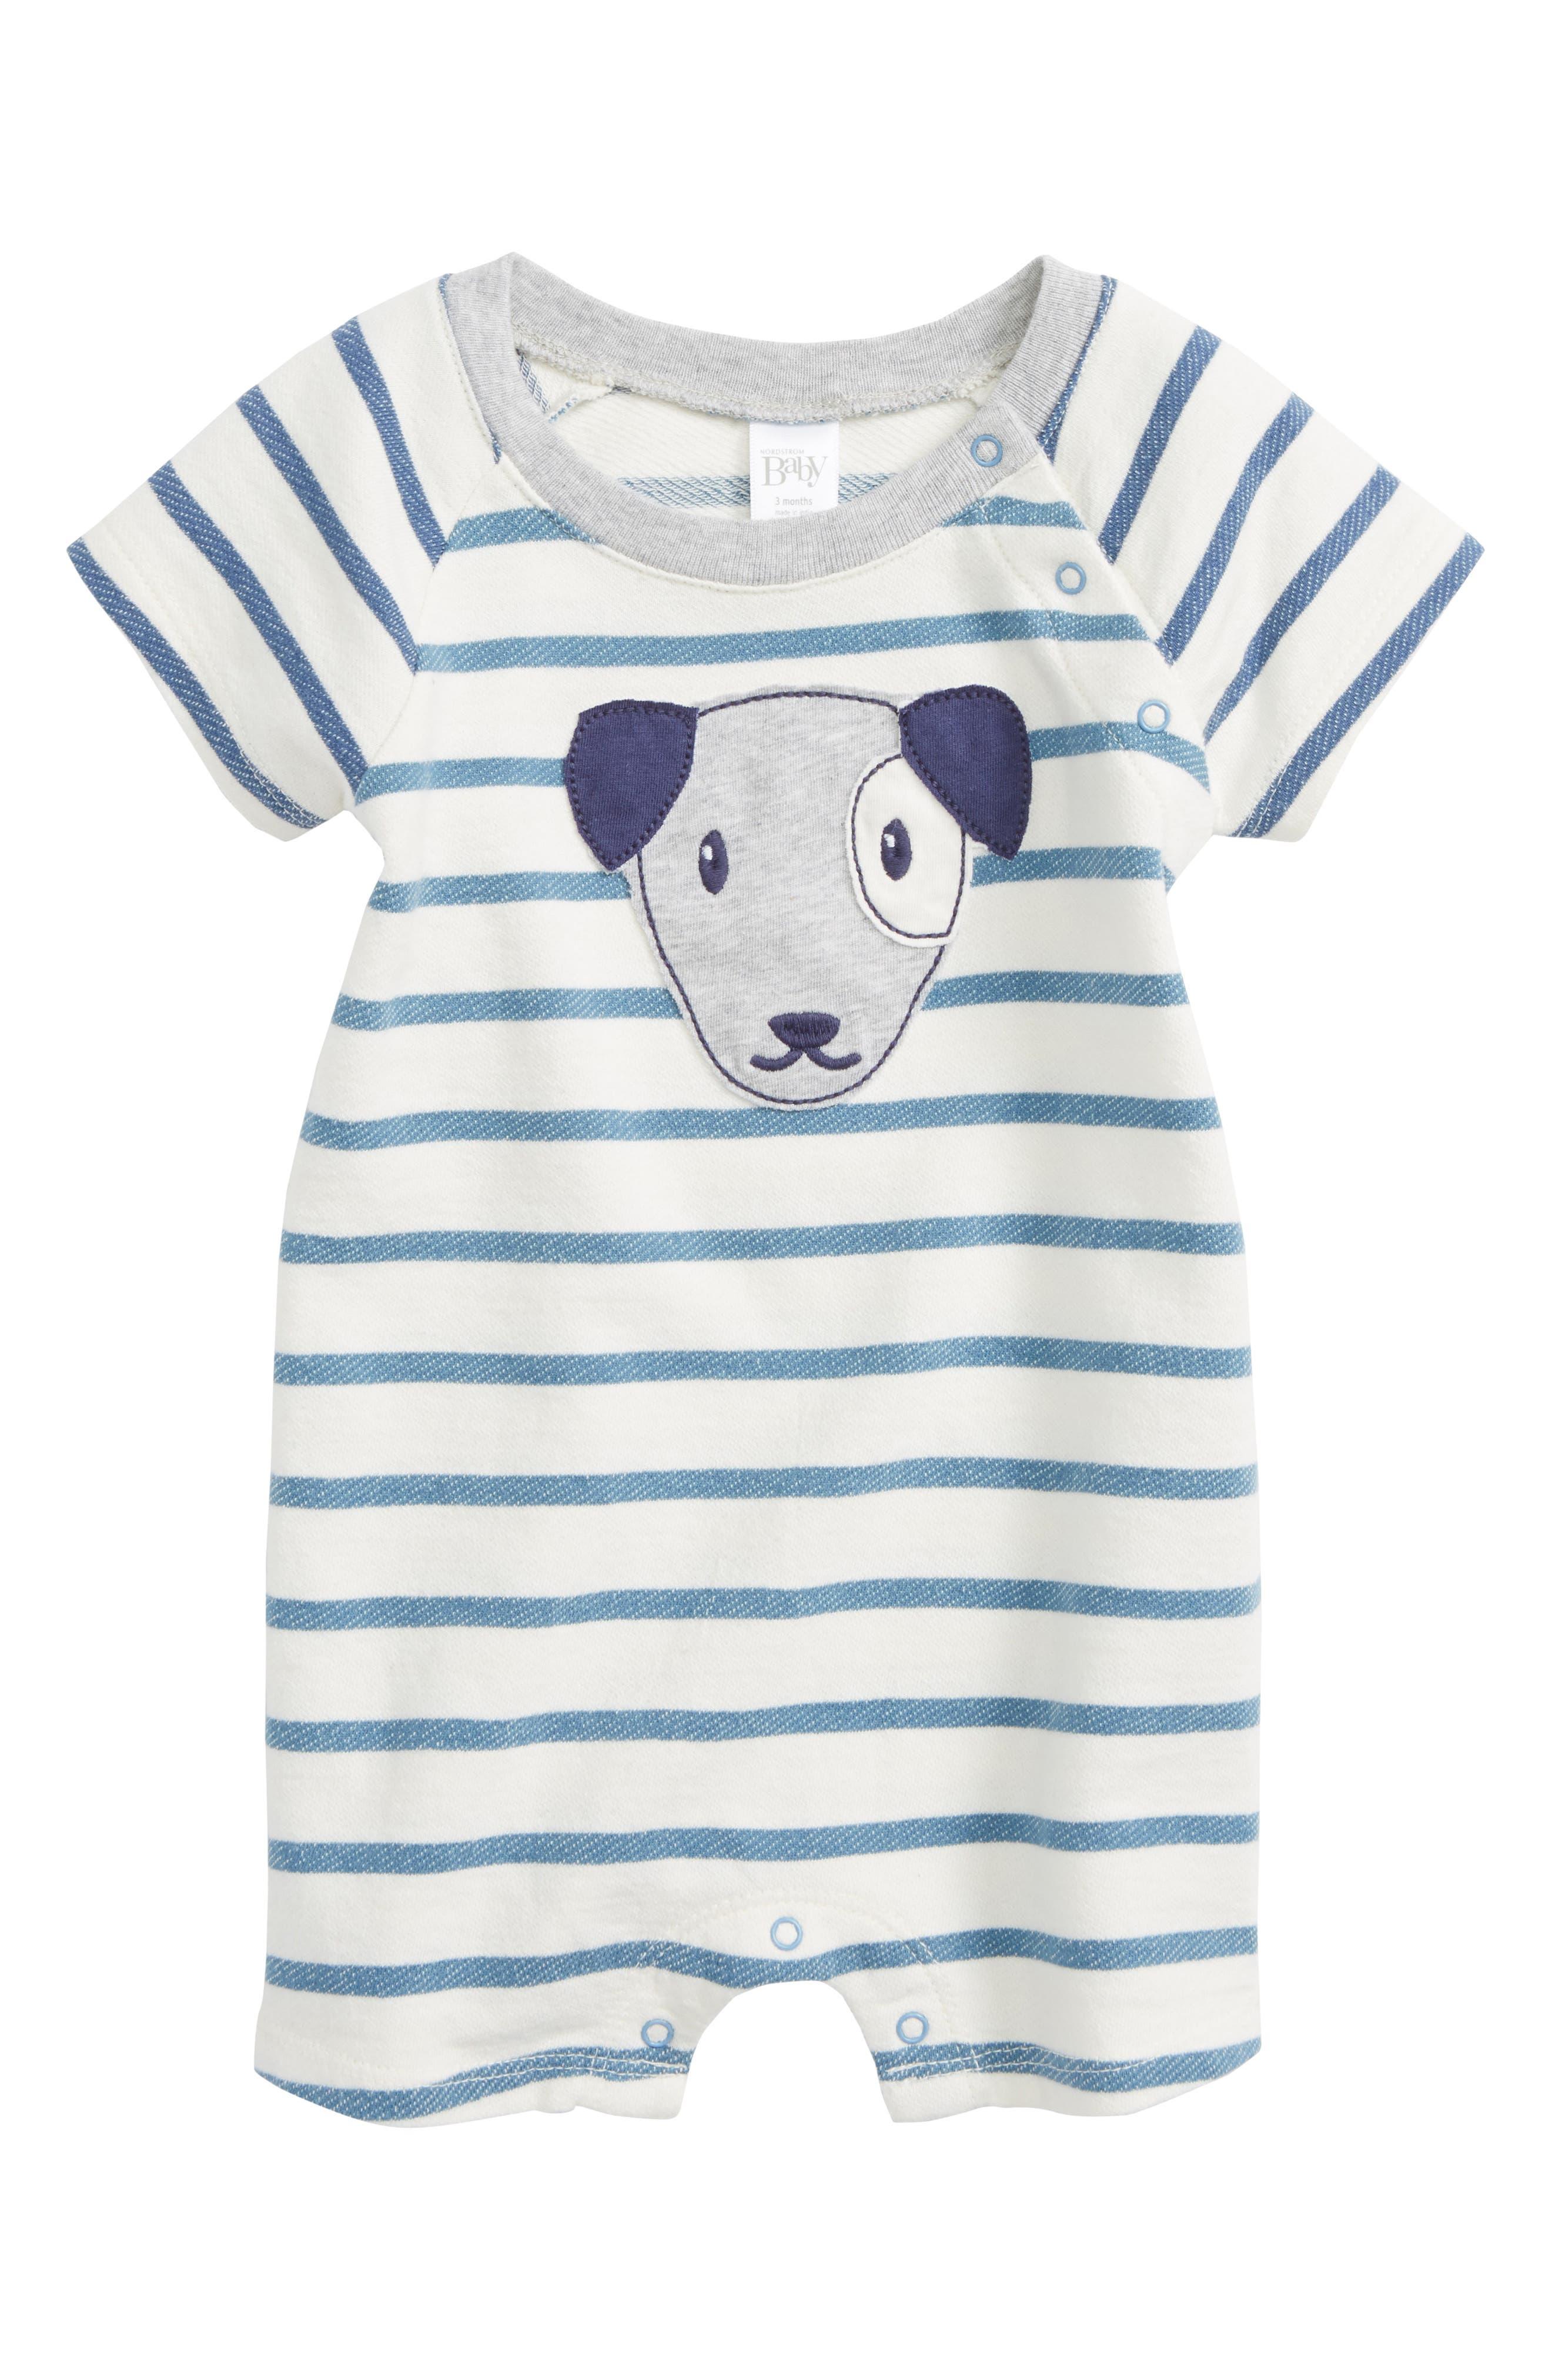 Alternate Image 1 Selected - Nordstrom Baby Dog Appliqué Stripe Romper (Baby Boys)